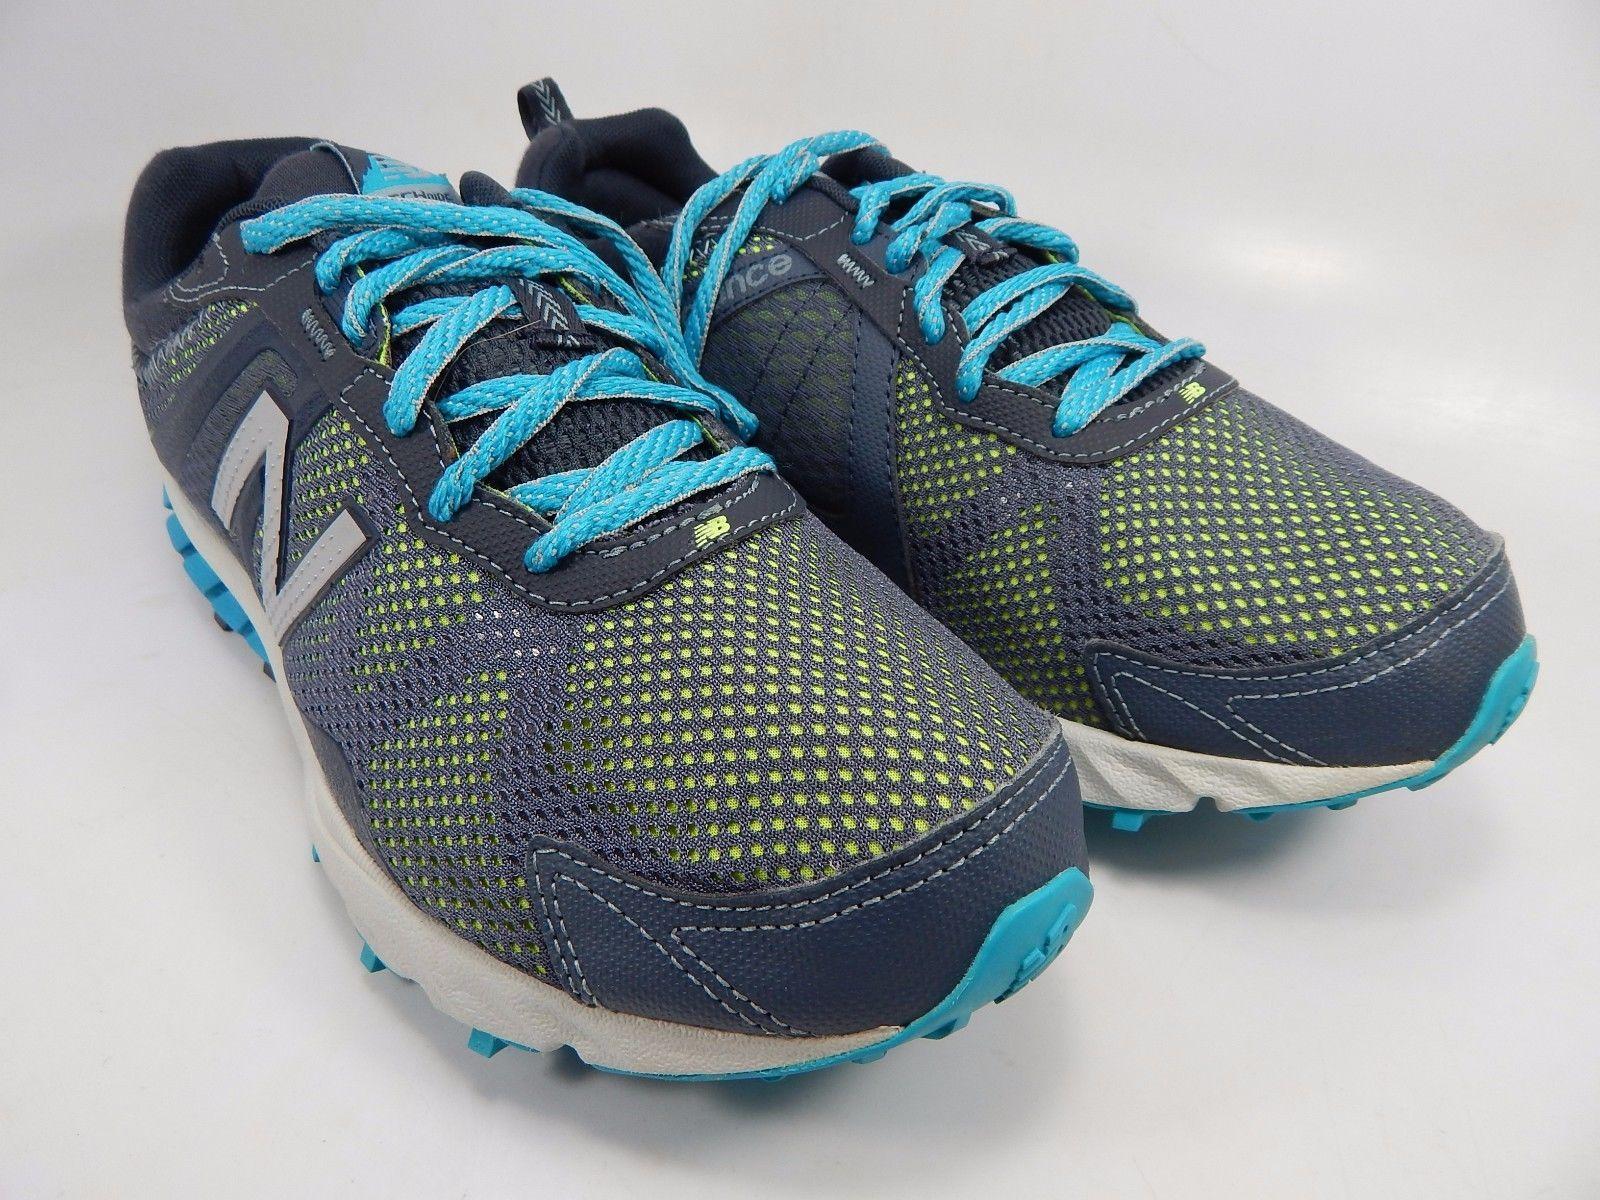 New Balance 610 v5 Women's Trail Running Shoes Size US 9 D WIDE EU 40.5 WT610LG5